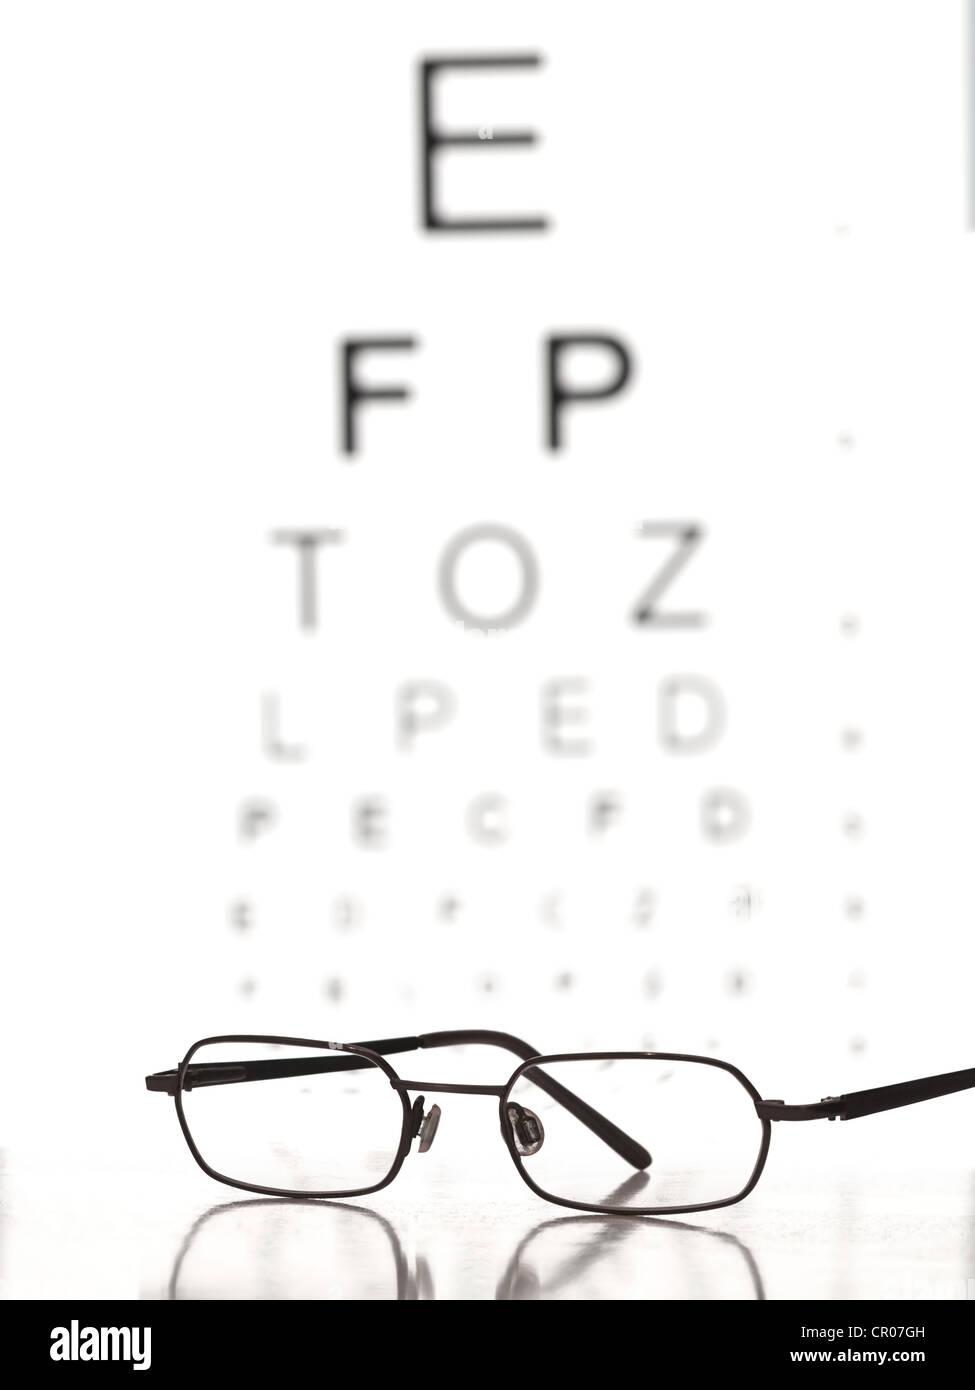 Glasses and the snellen eye chart for eye sight testinghealth glasses and the snellen eye chart for eye sight testinghealth care and medicine themes nvjuhfo Gallery